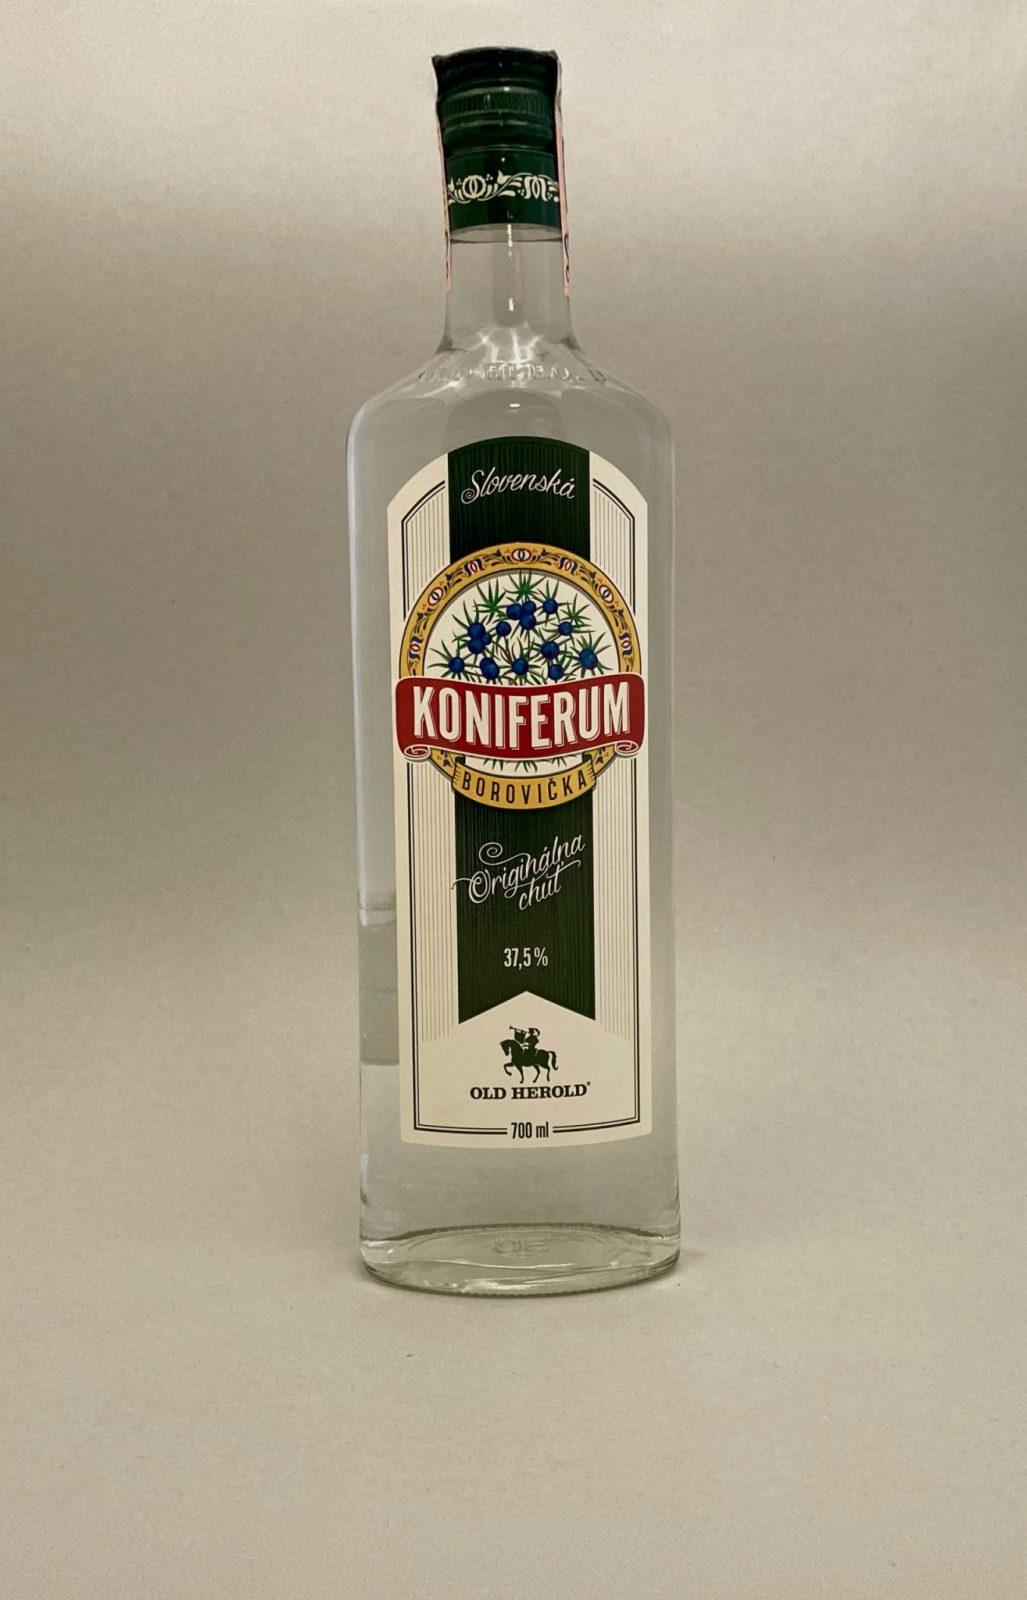 Koniferum Borovička 37,5%, Bottleshop Sunny wines slnecnice mesto, petrzalka, destiláty, rozvoz alkoholu, eshop